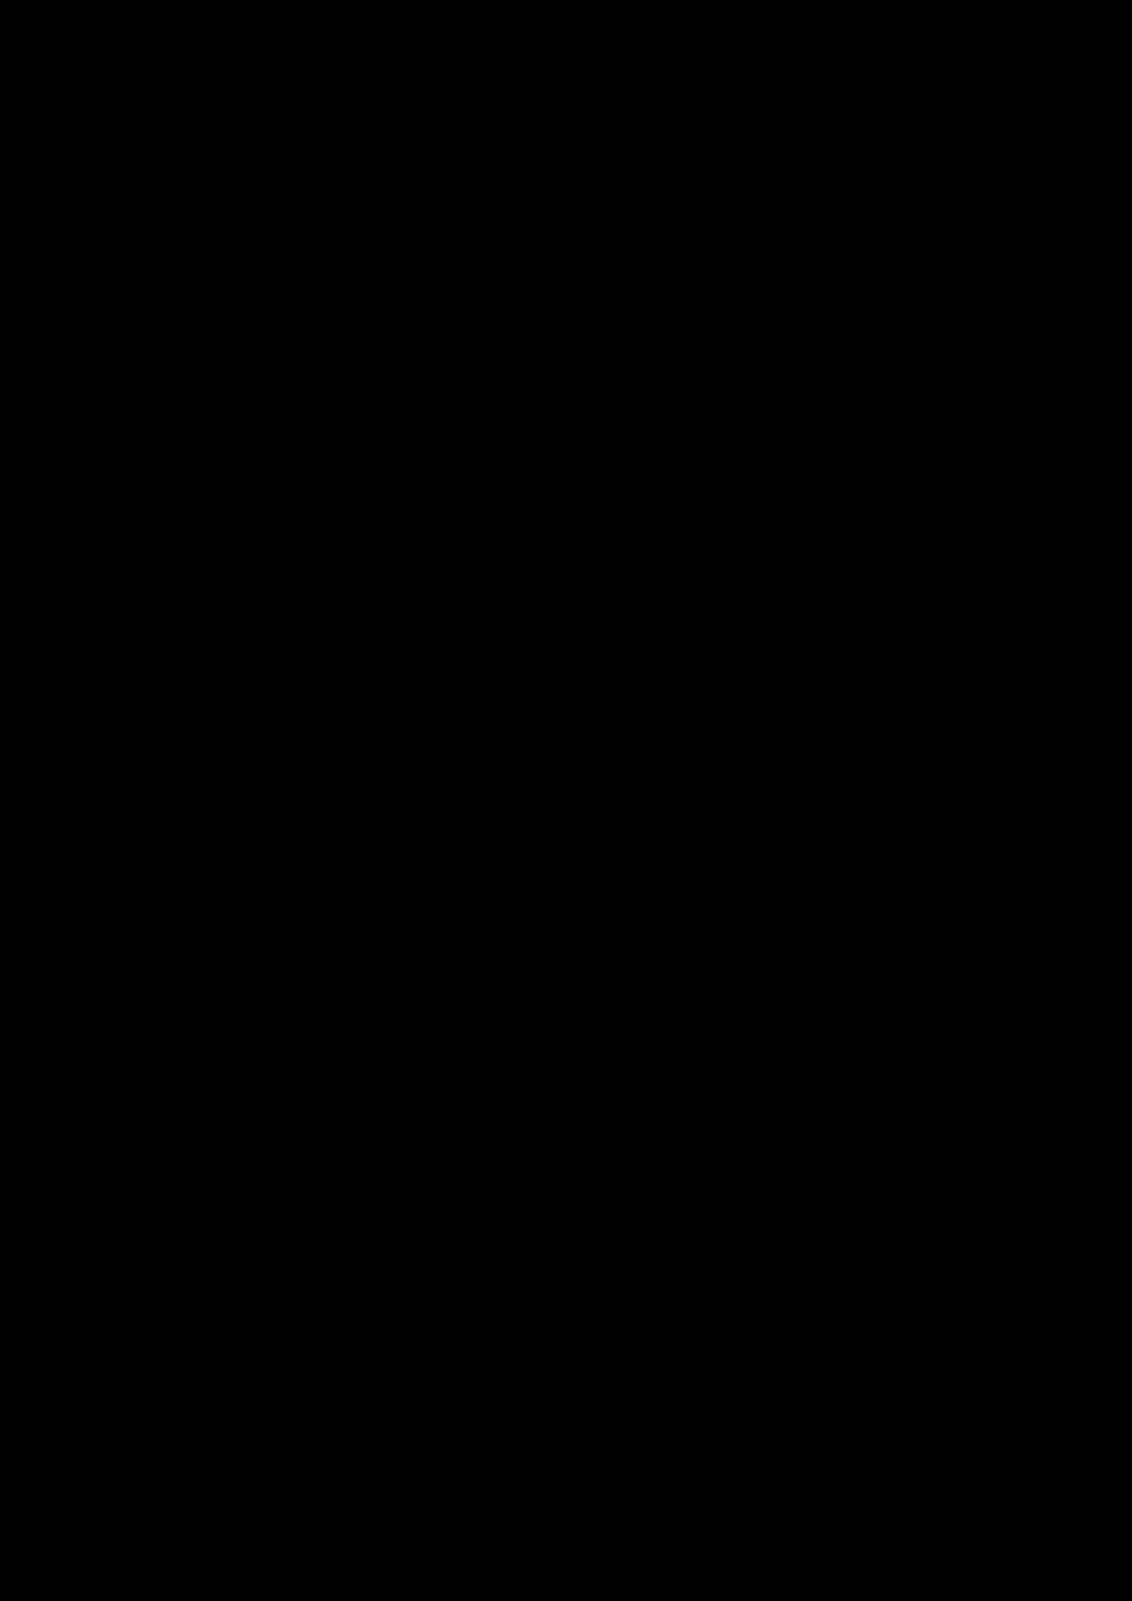 Belyiy sokol slide, Image 88